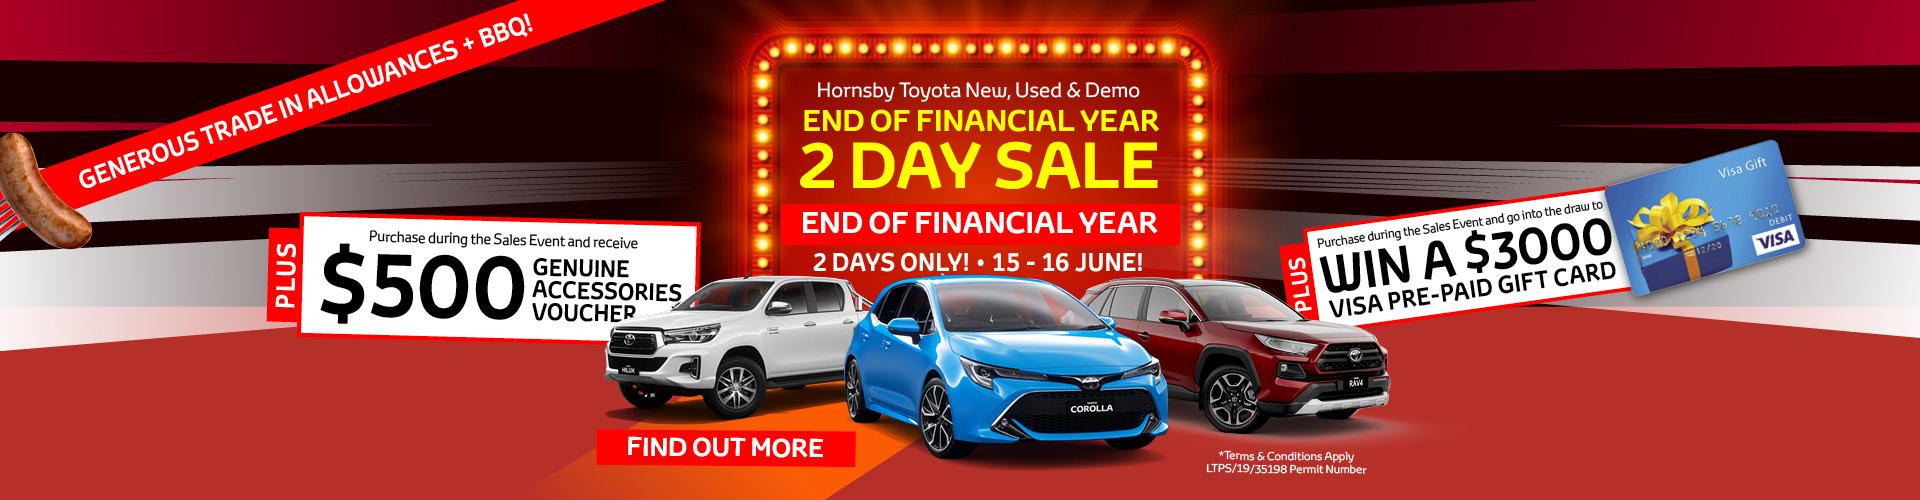 Hornsby Toyota - EOFY Sale